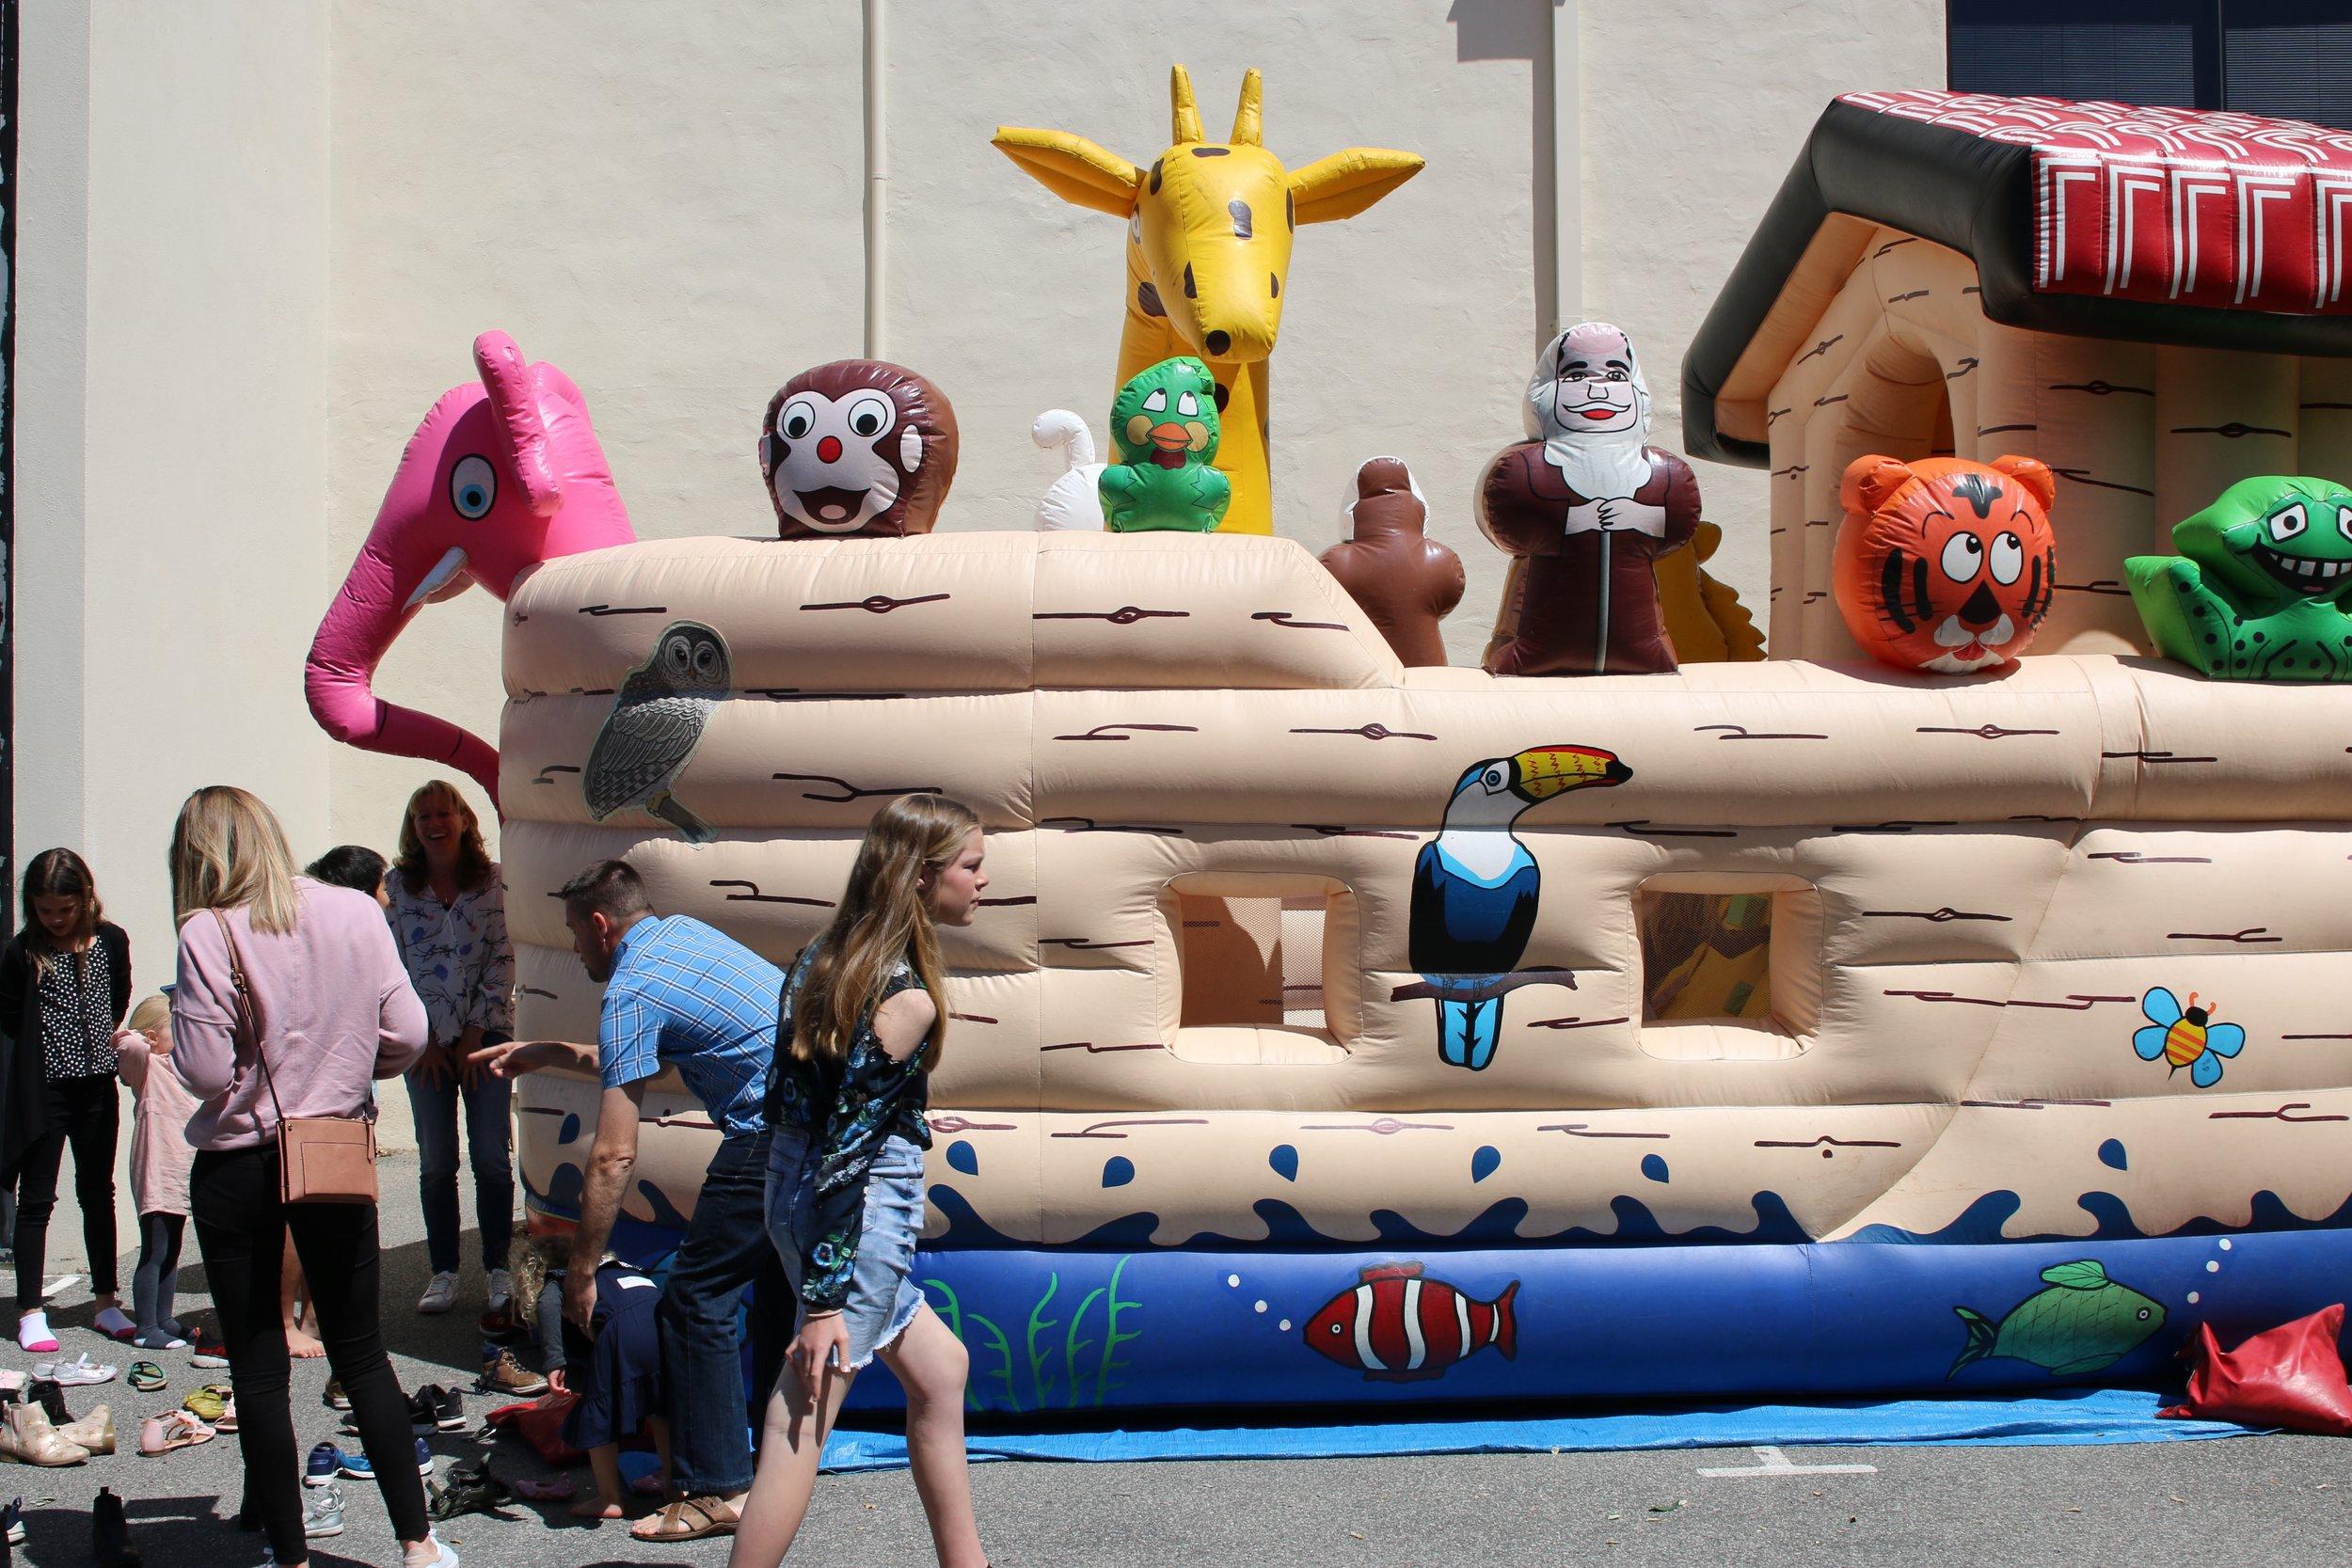 urban kids bouncry castle.jpg